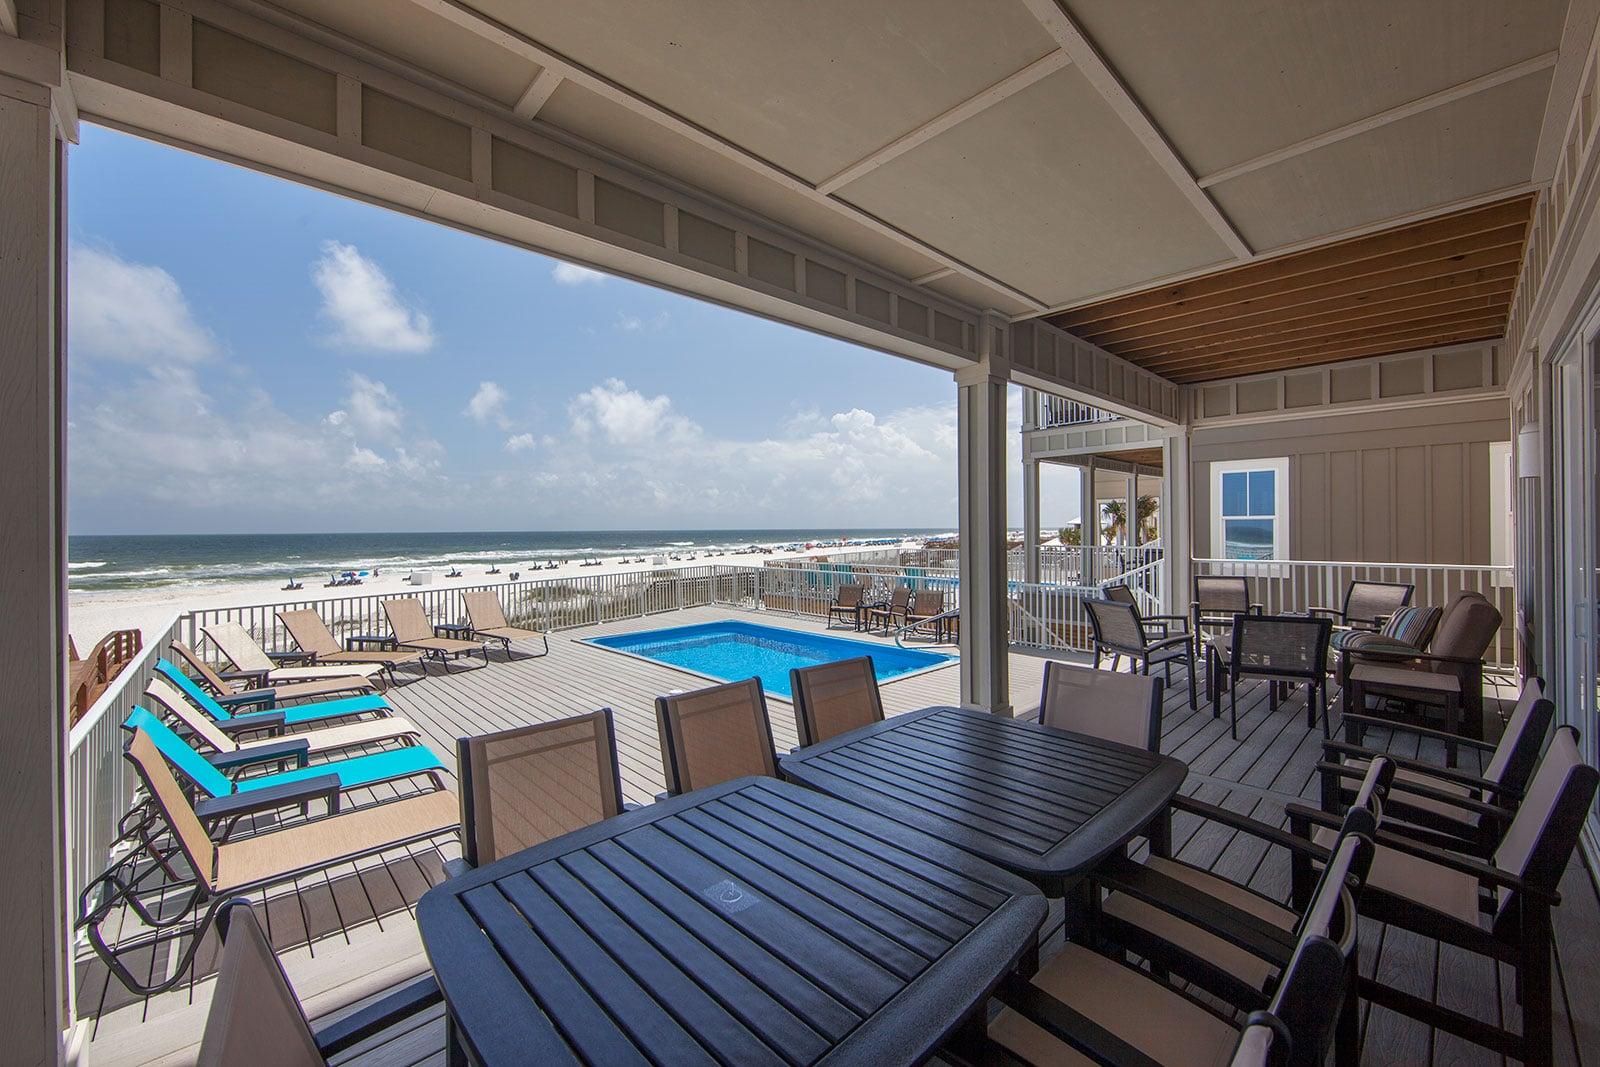 shores and gulf beachfront rentals beach alabama orange cottages condos